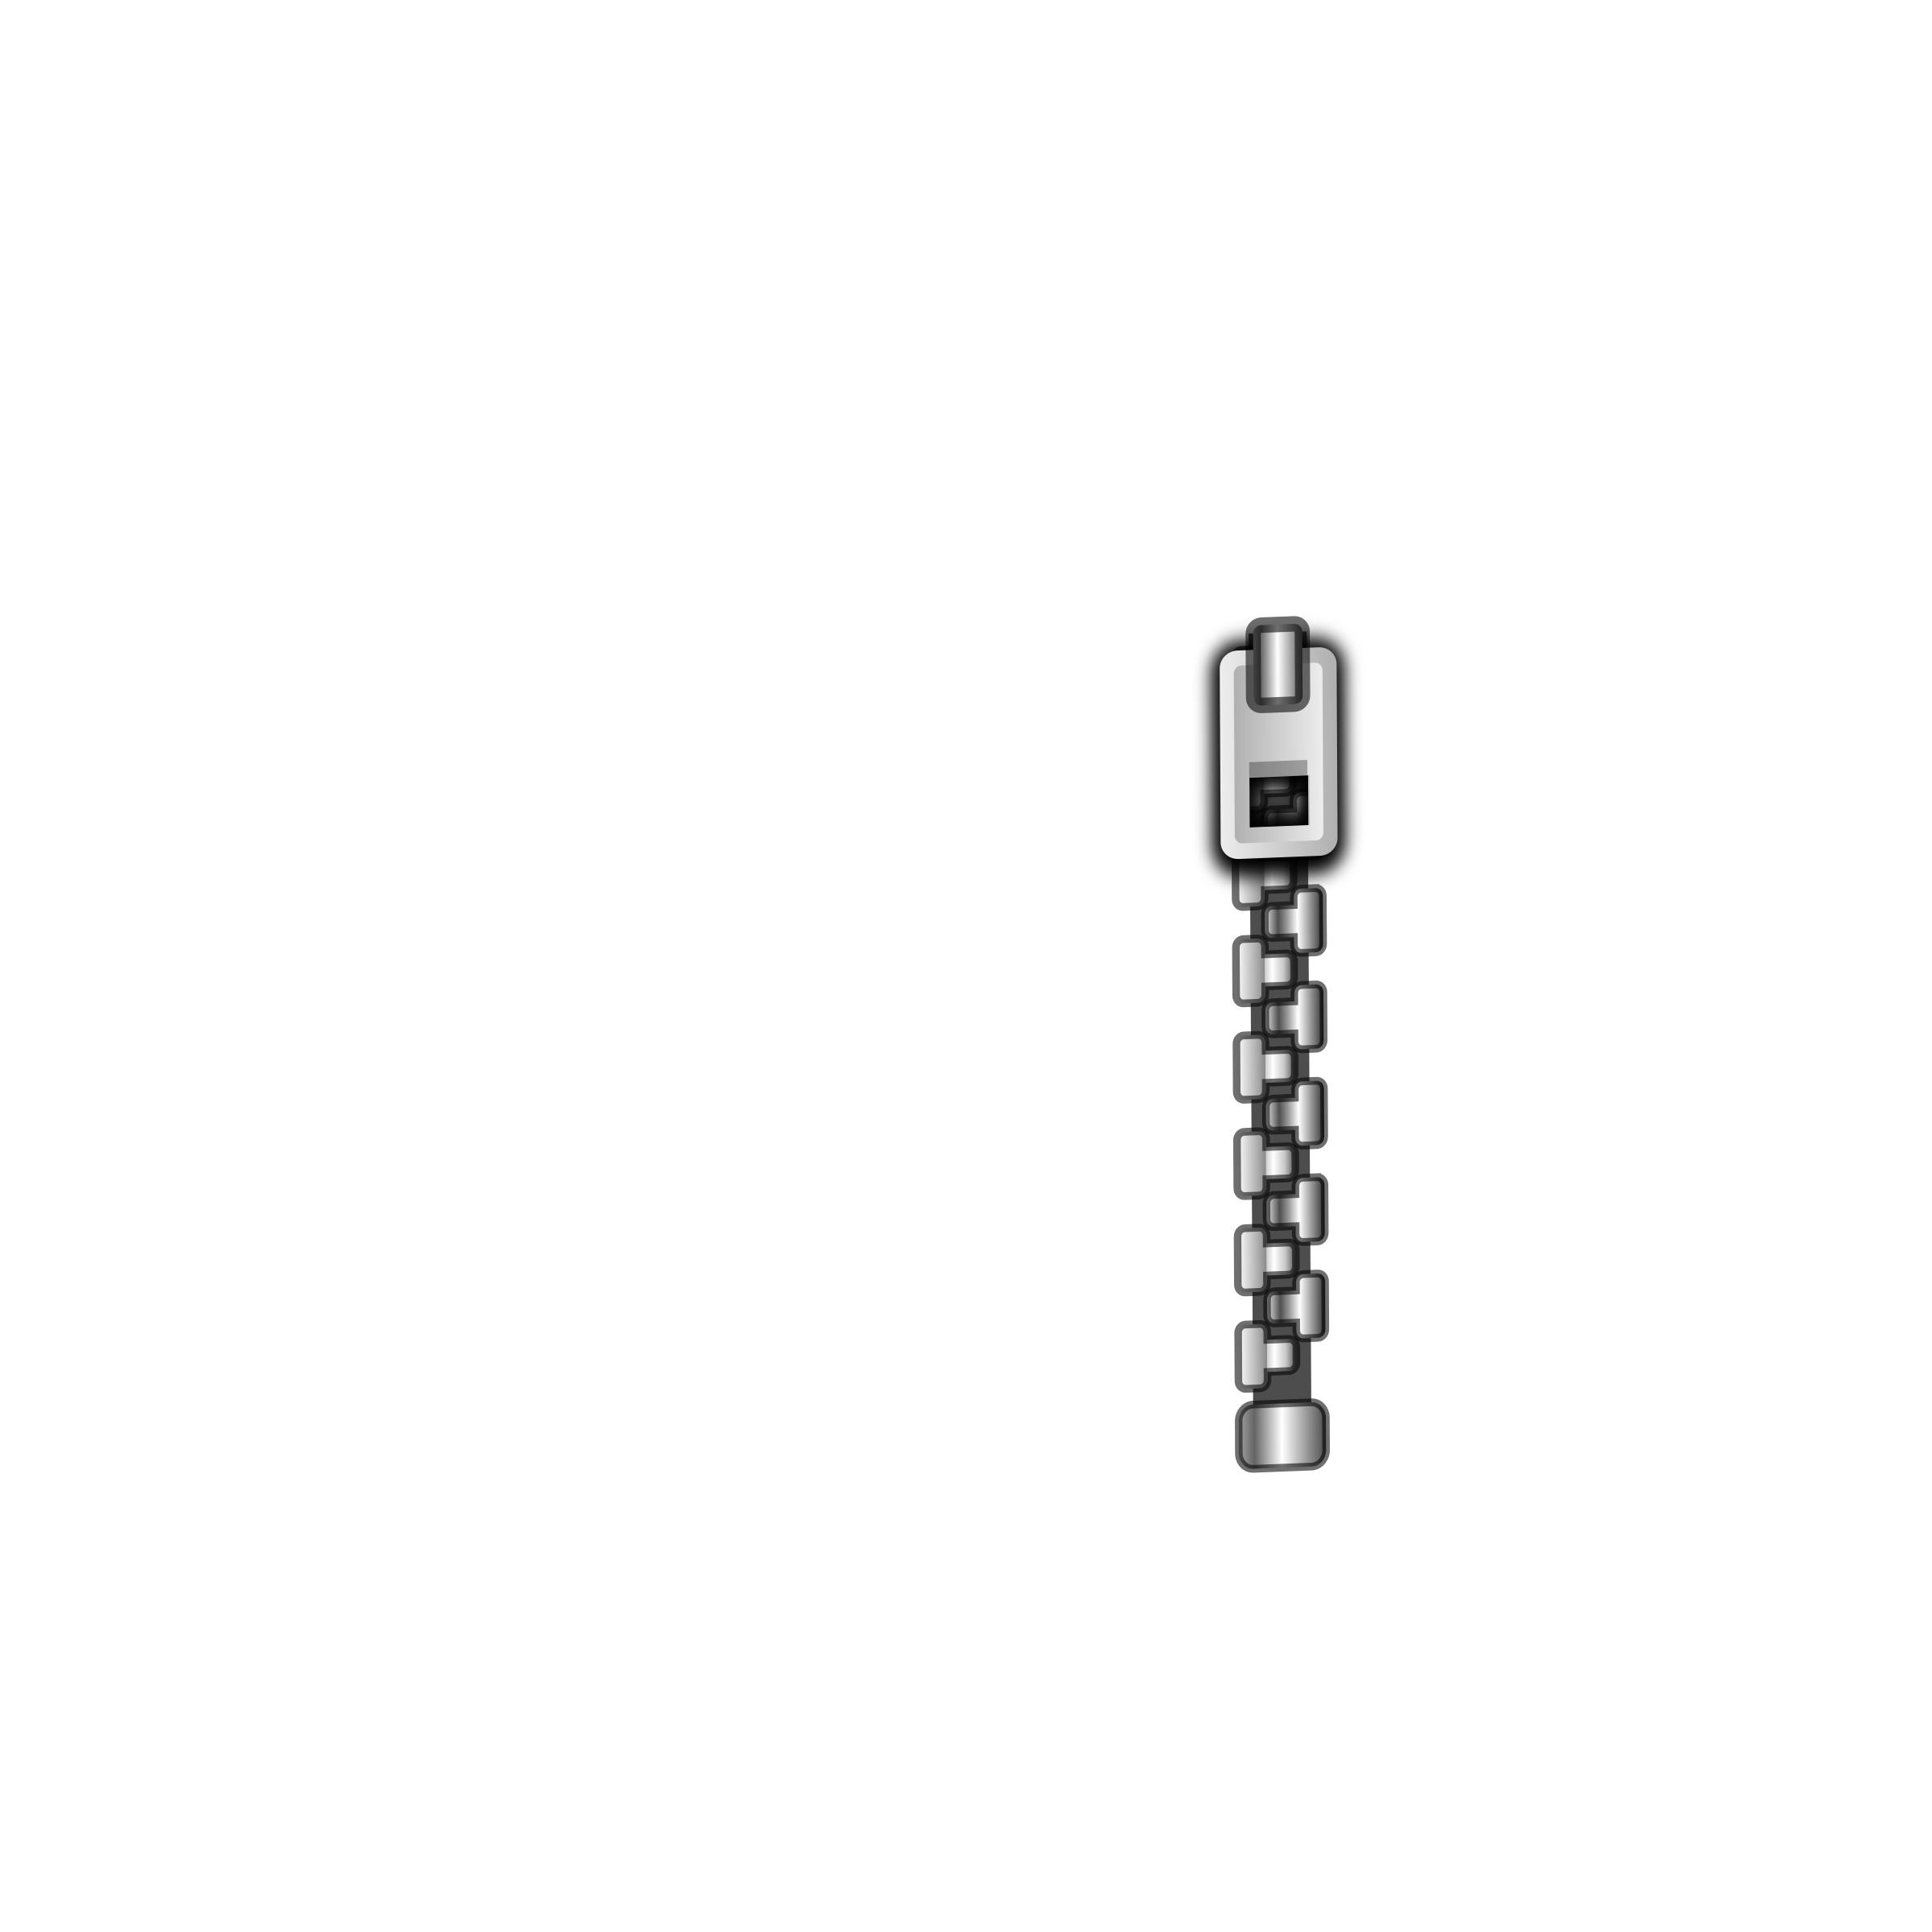 Zipper clipart transparent Clipart Zip Zip